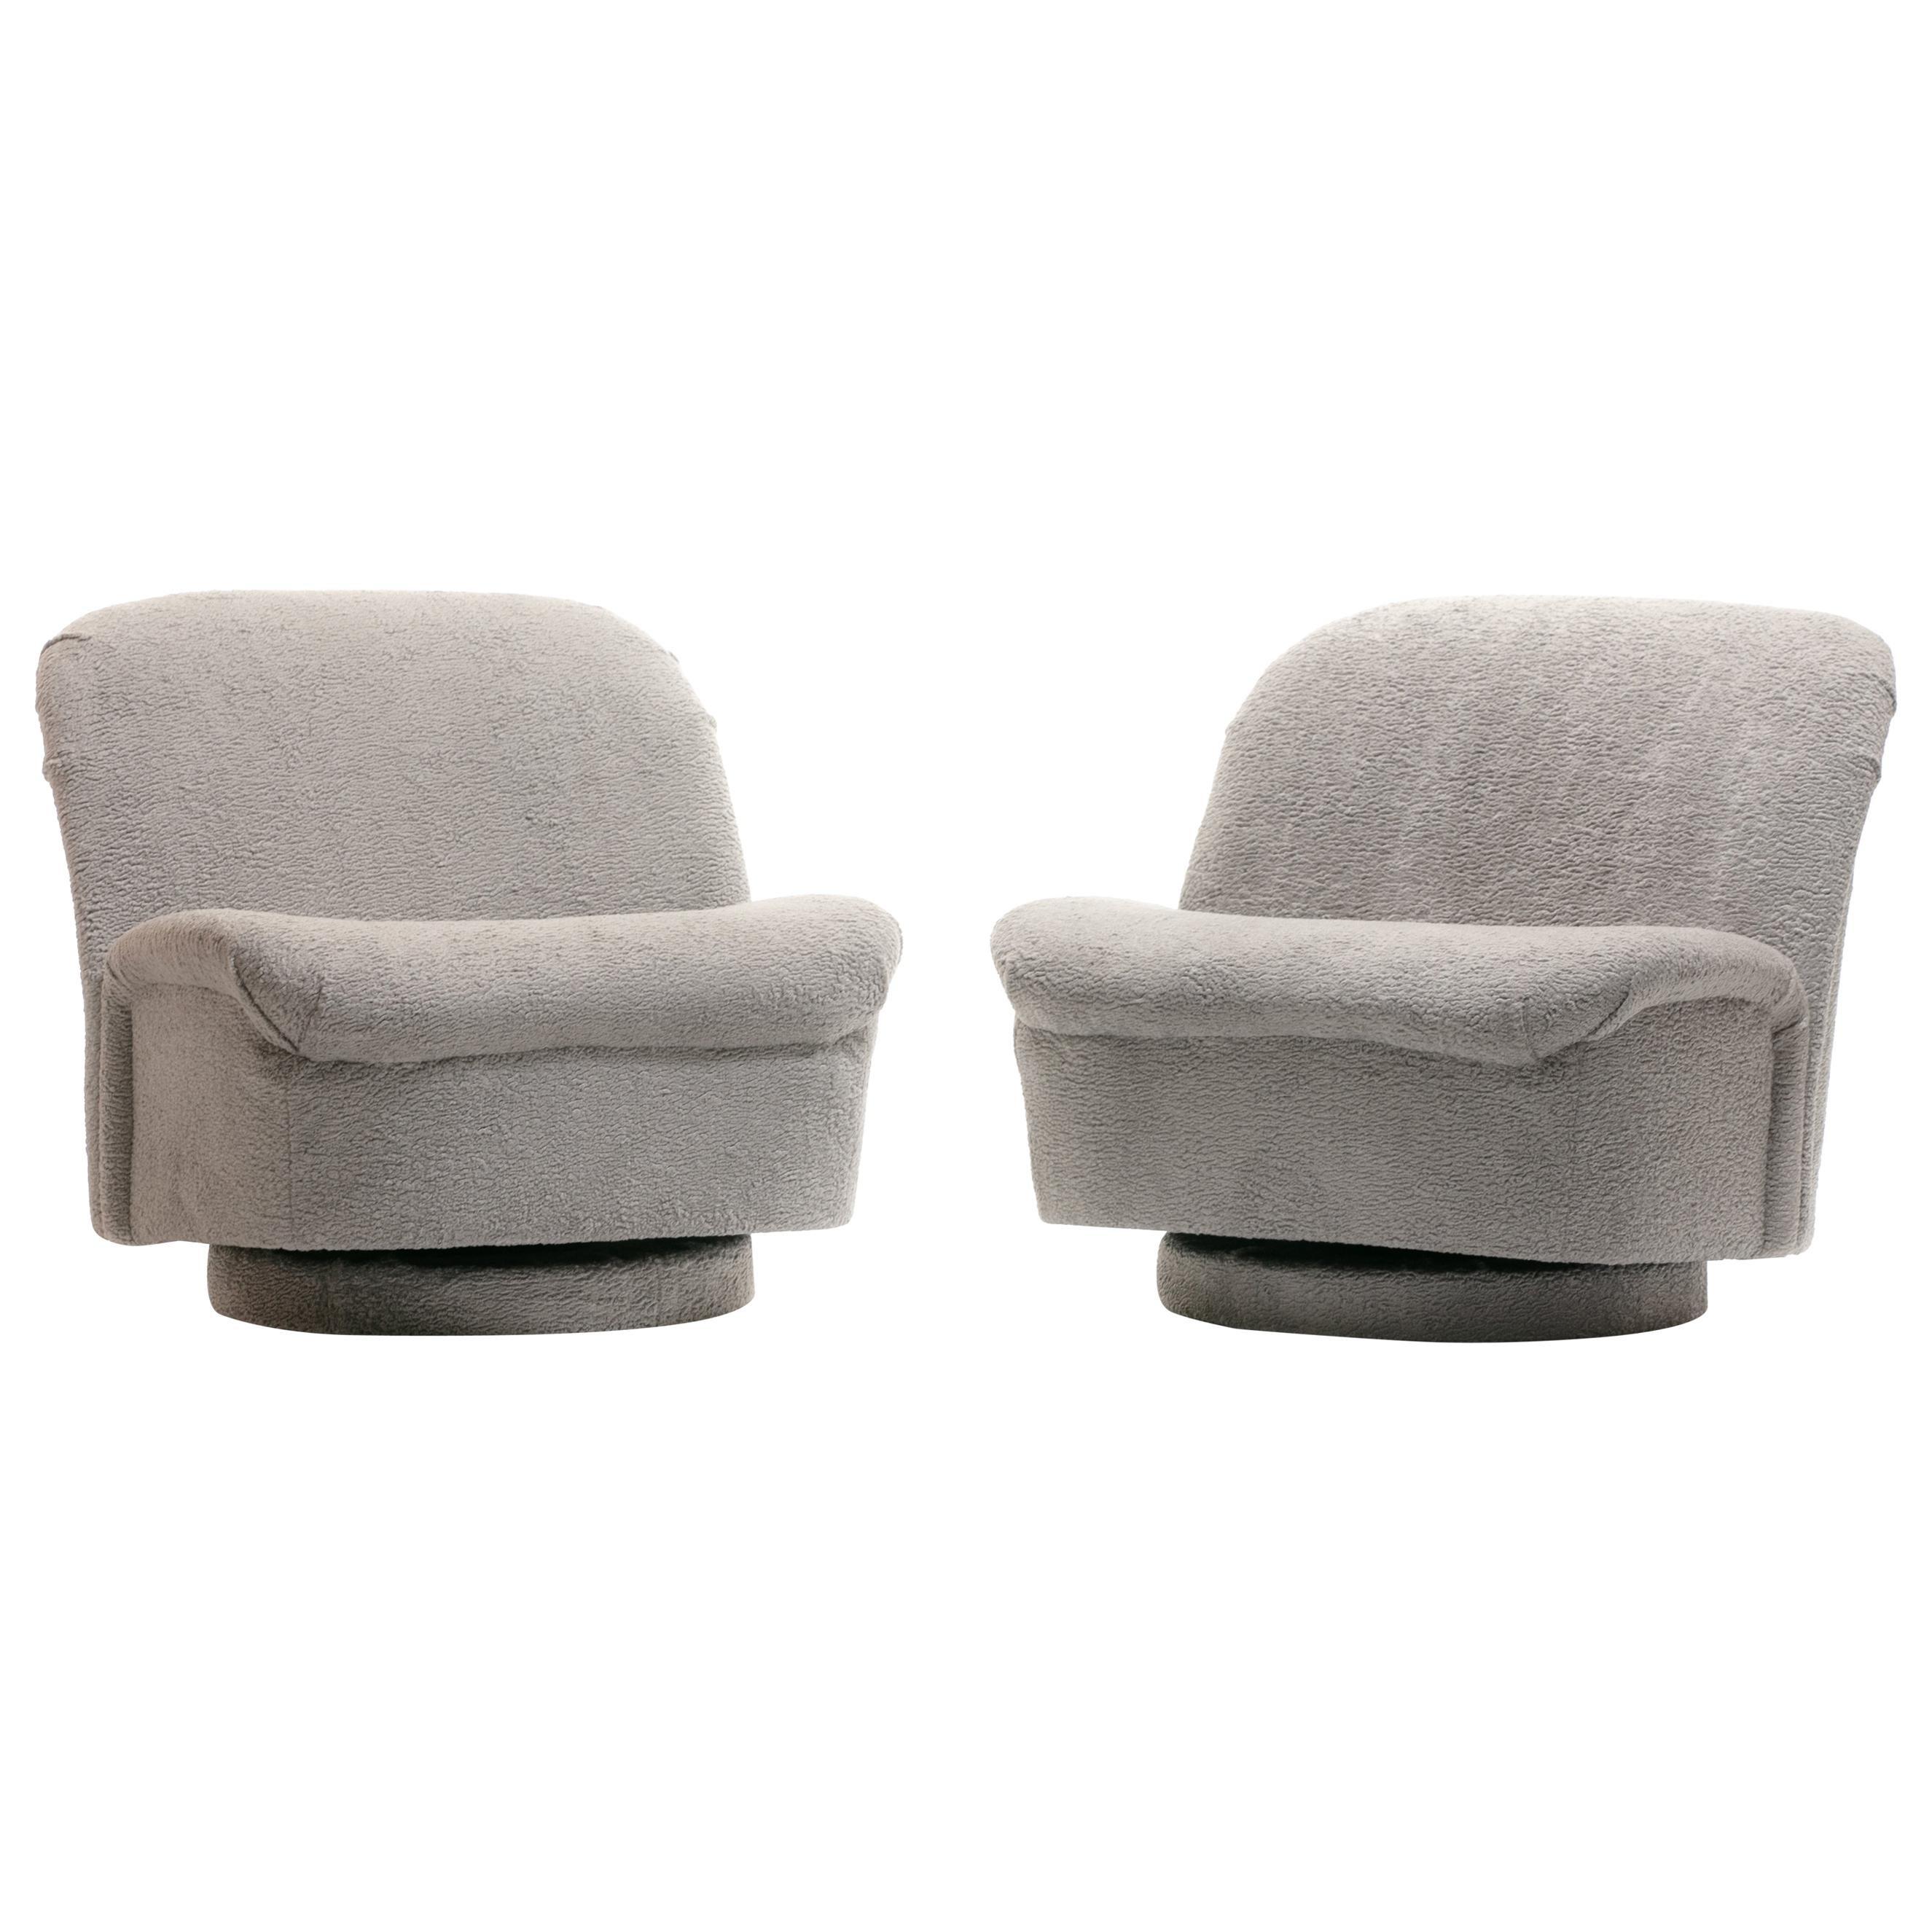 Pair of Vladimir Kagan for Directional Swivel Lounge Chairs in Faux Persian Lamb